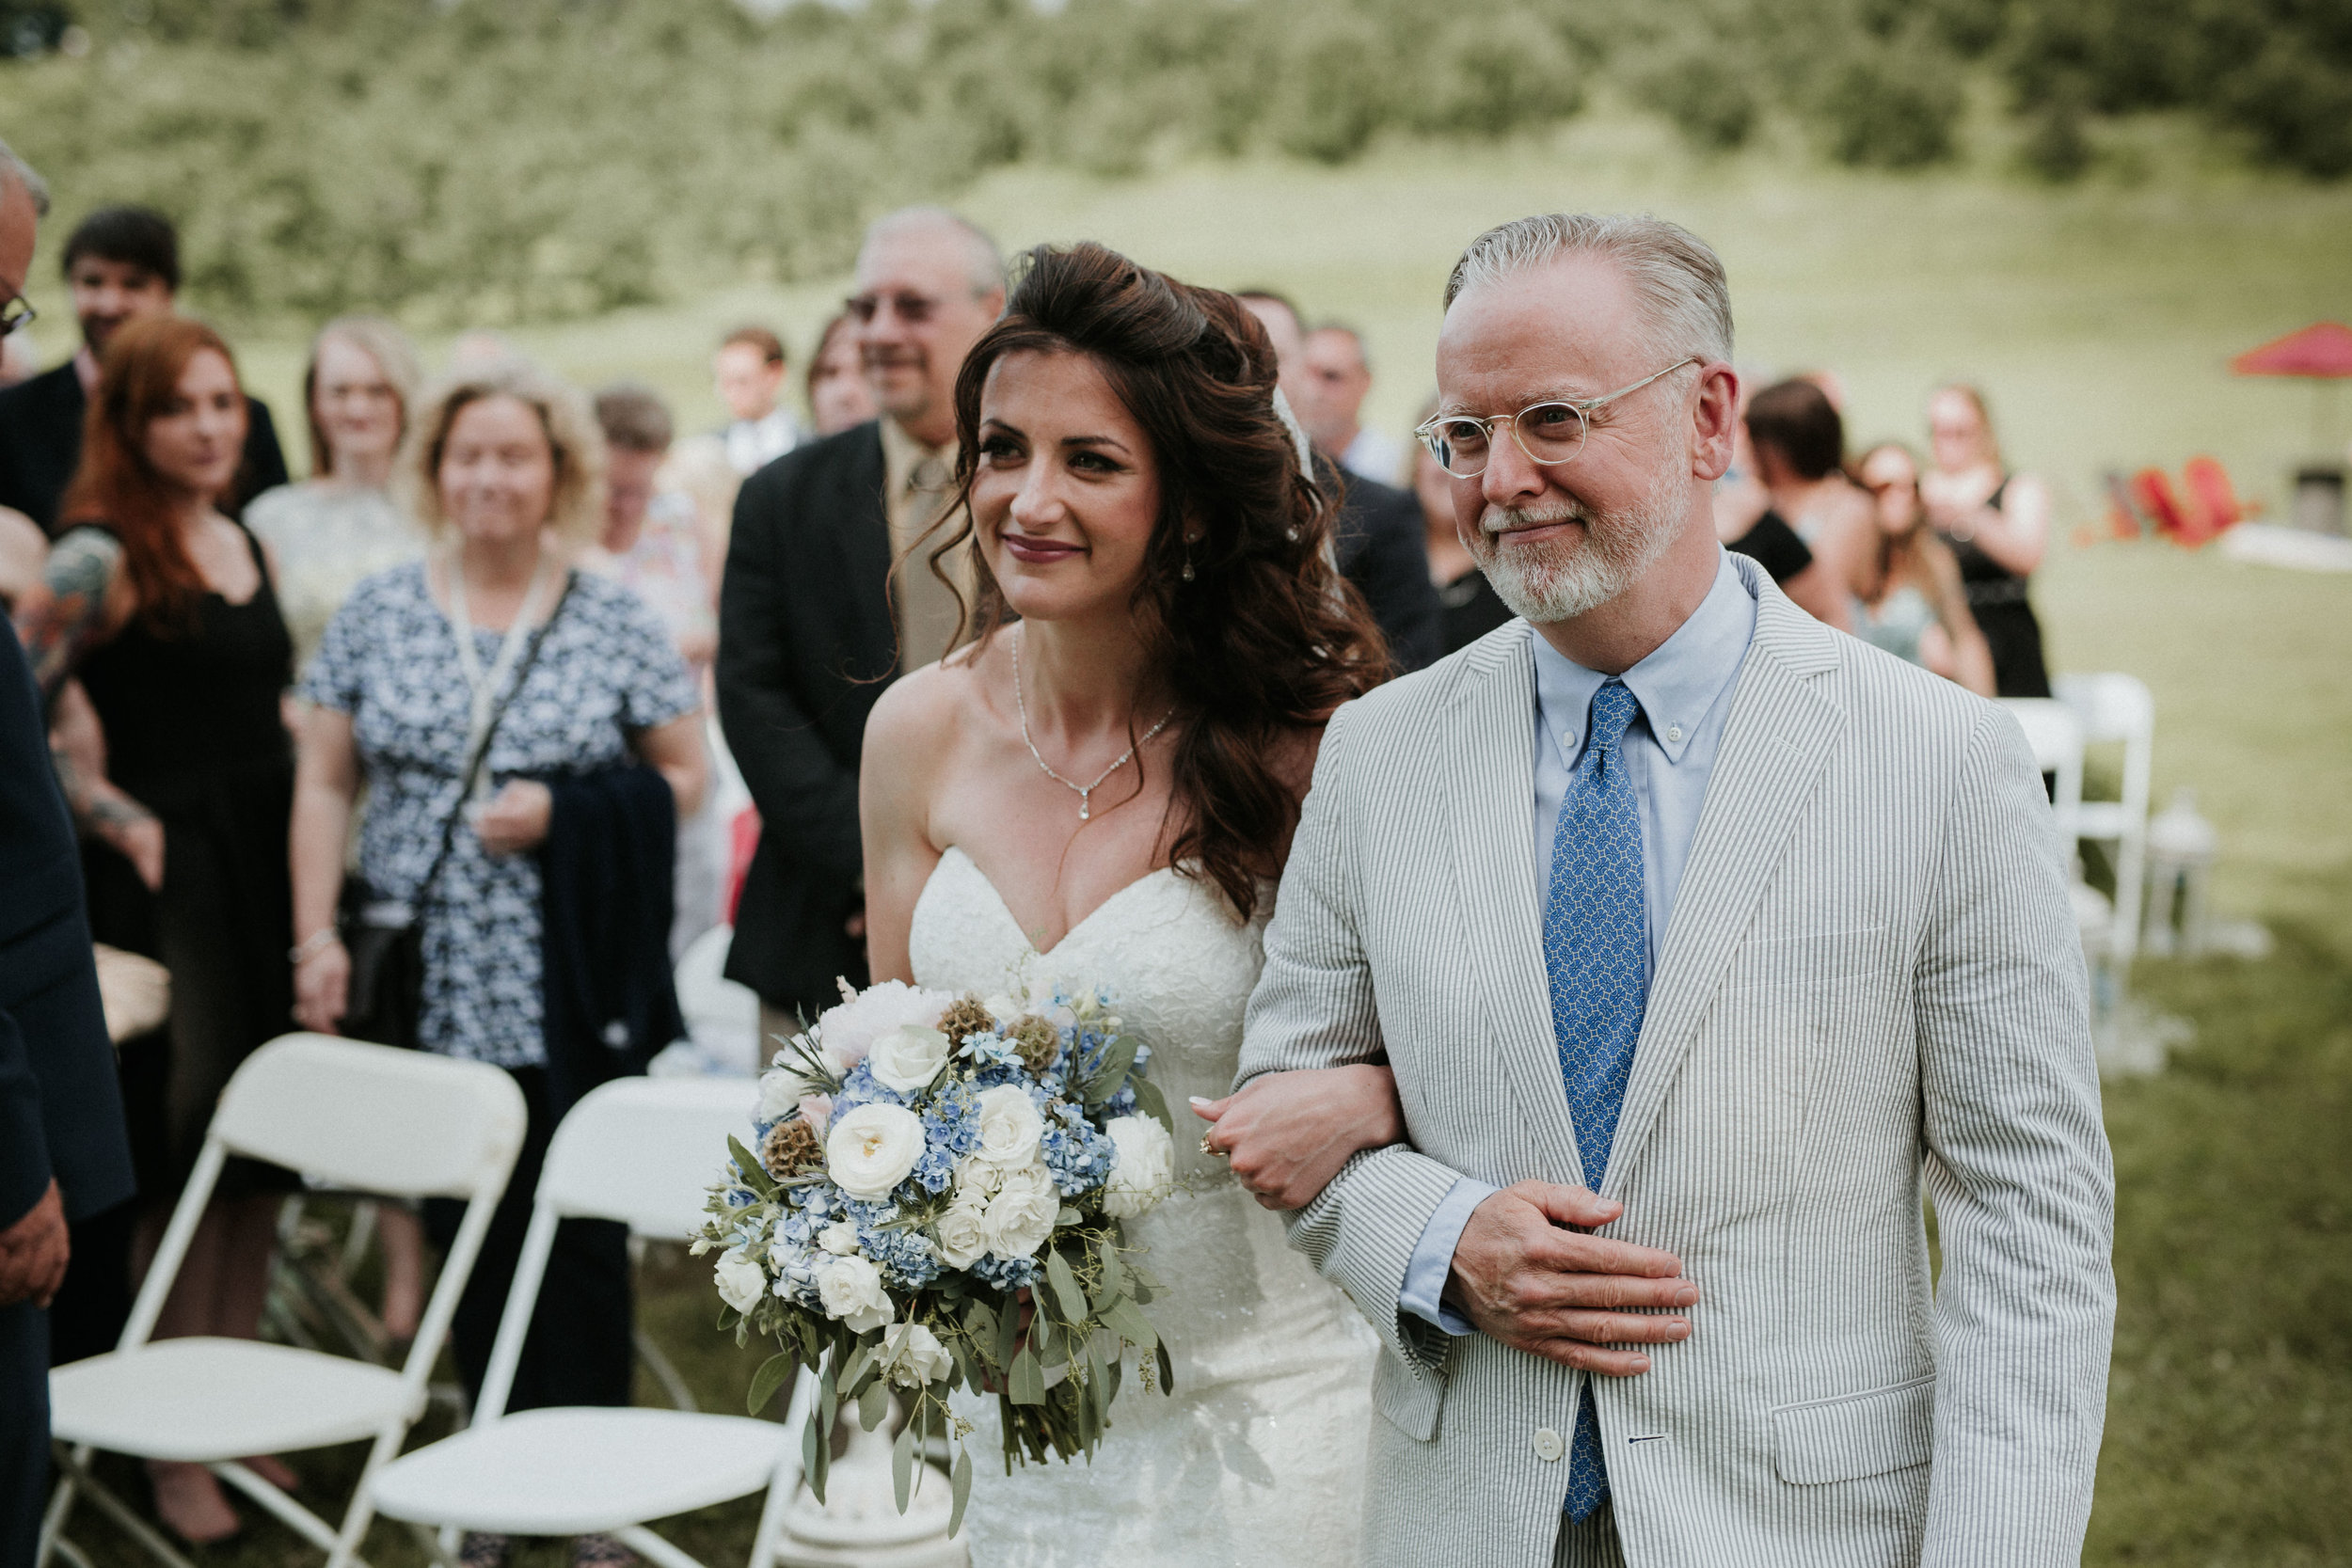 nostrano_vineyards_wedding_0043.JPG